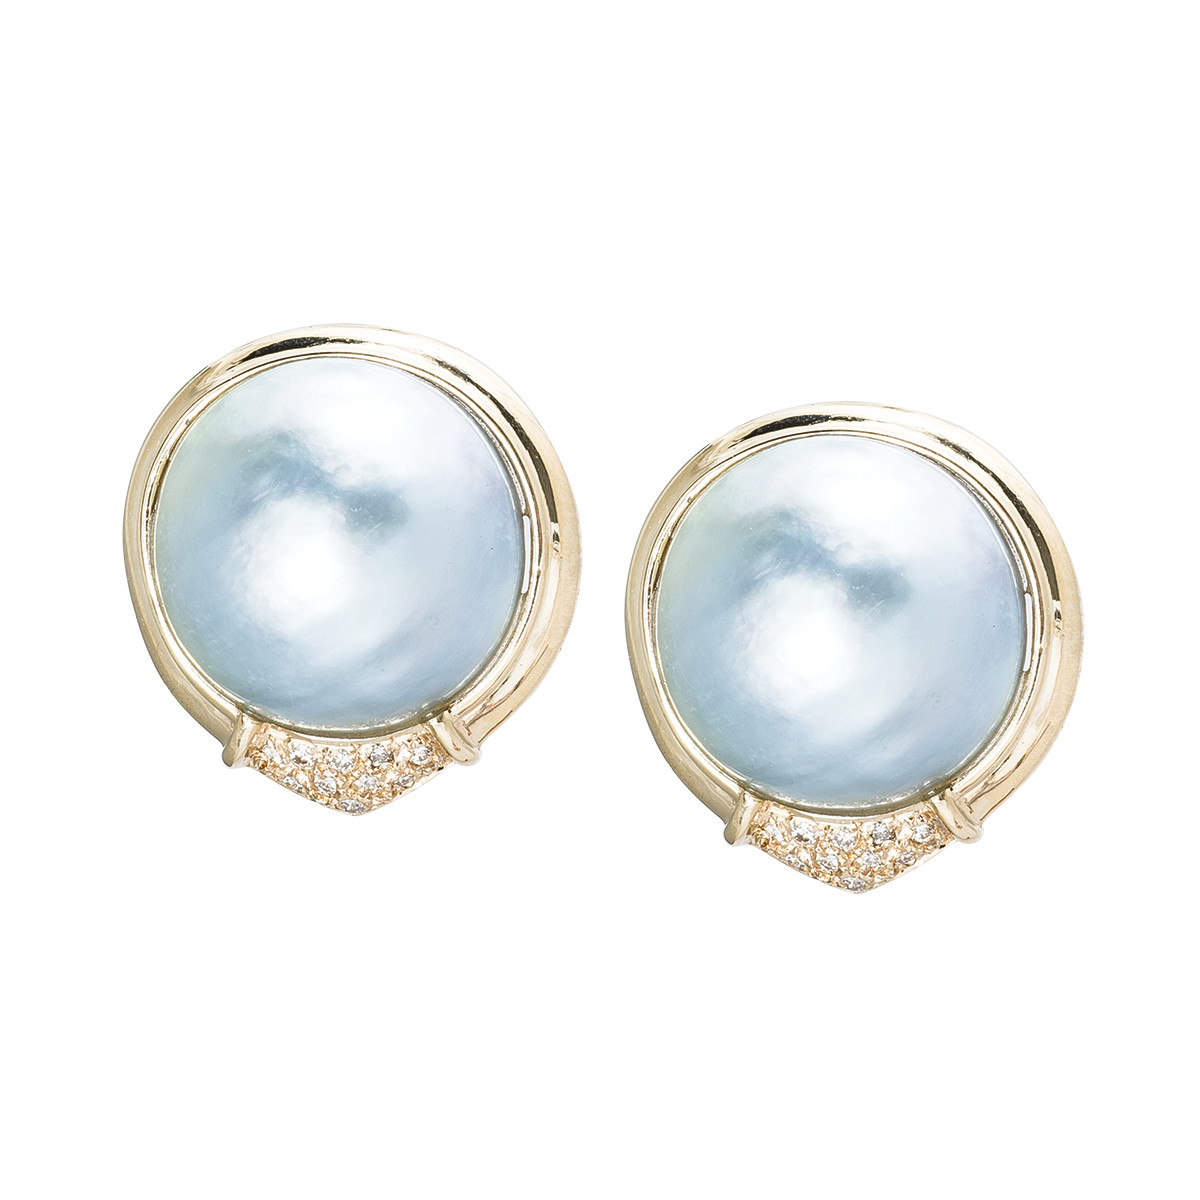 Vintage 0.20 CTW Diamond & Silver Mabe Pearl Earrings